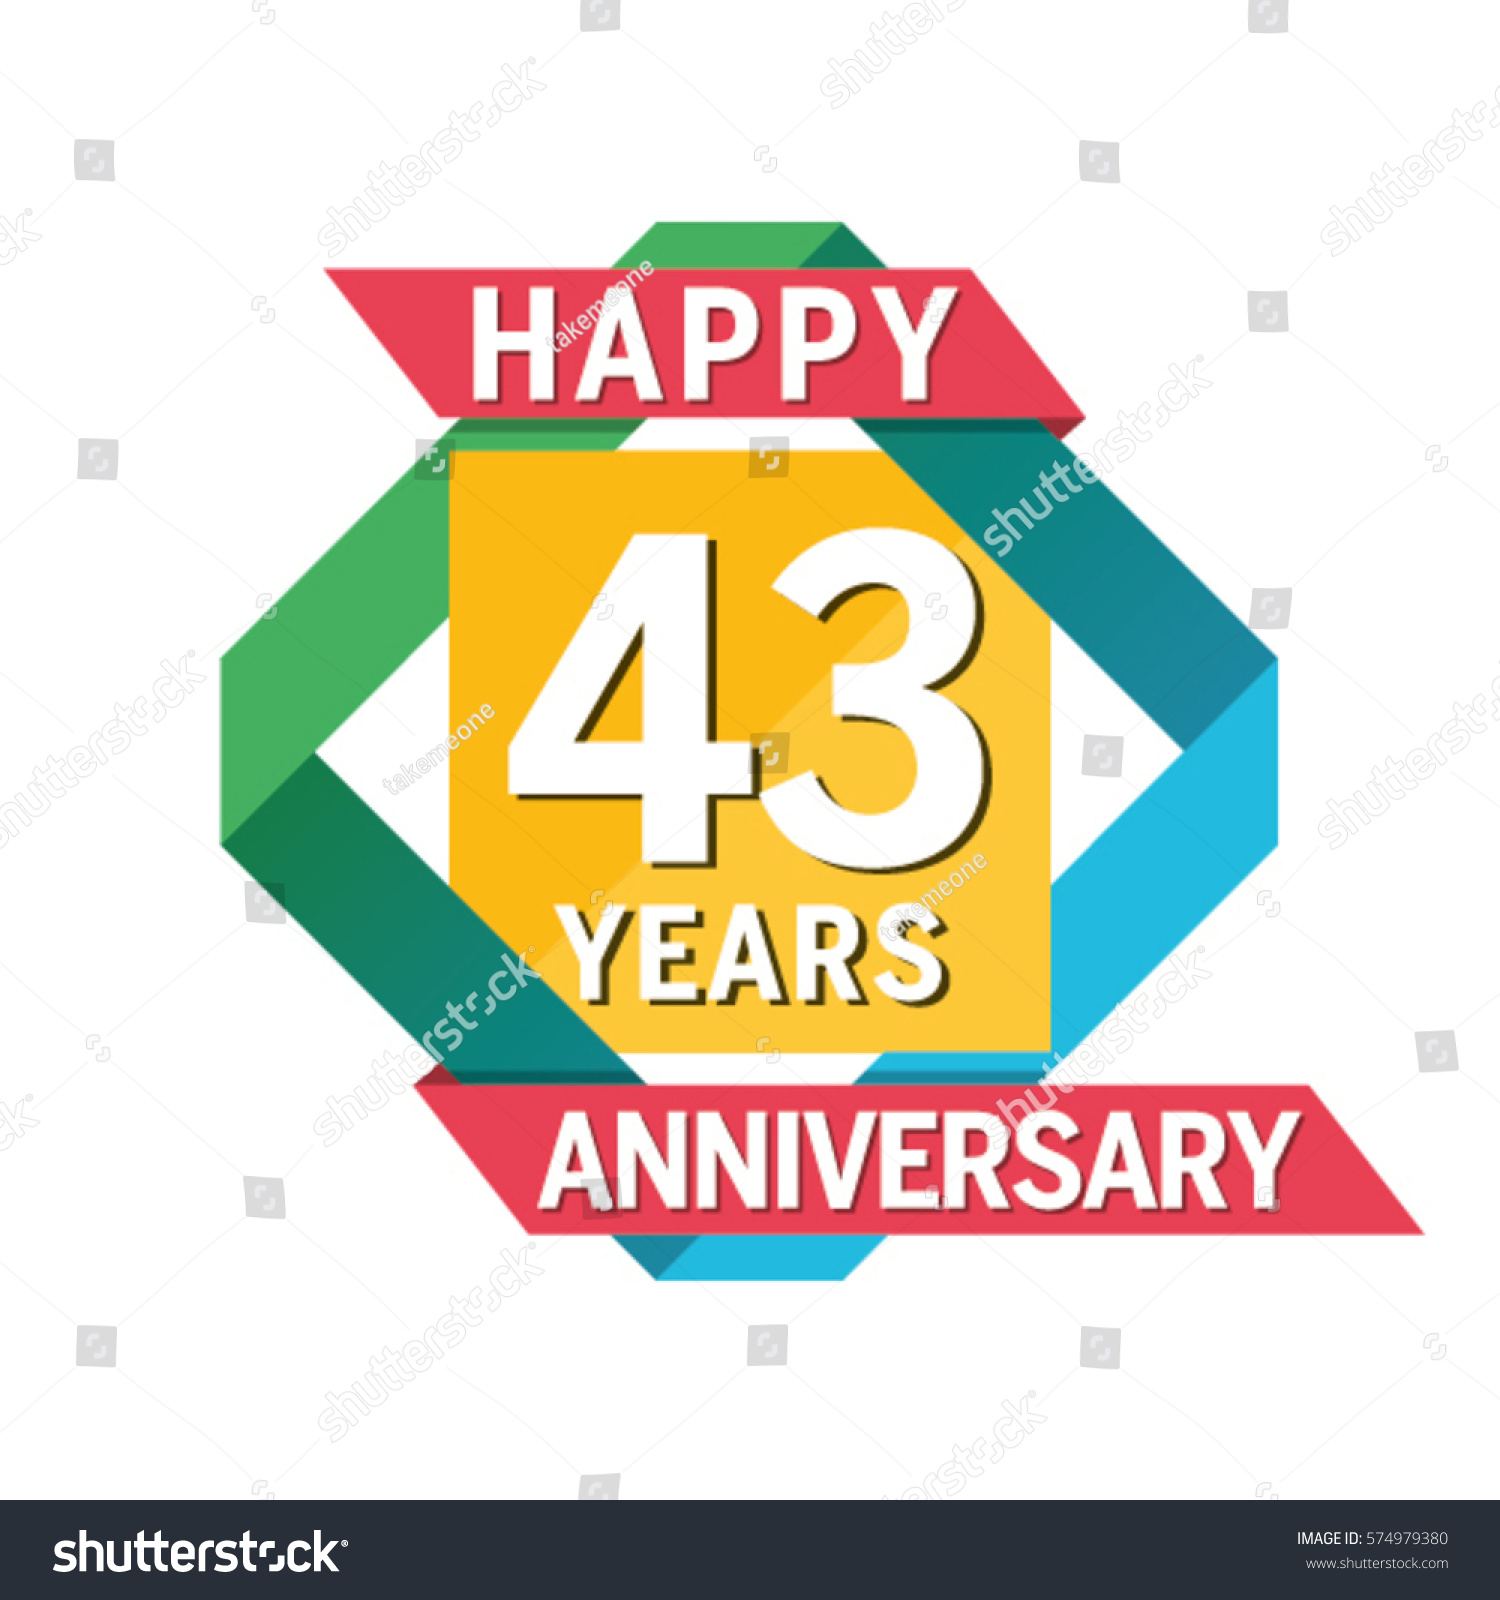 Anniversary banner celebration years stock vector